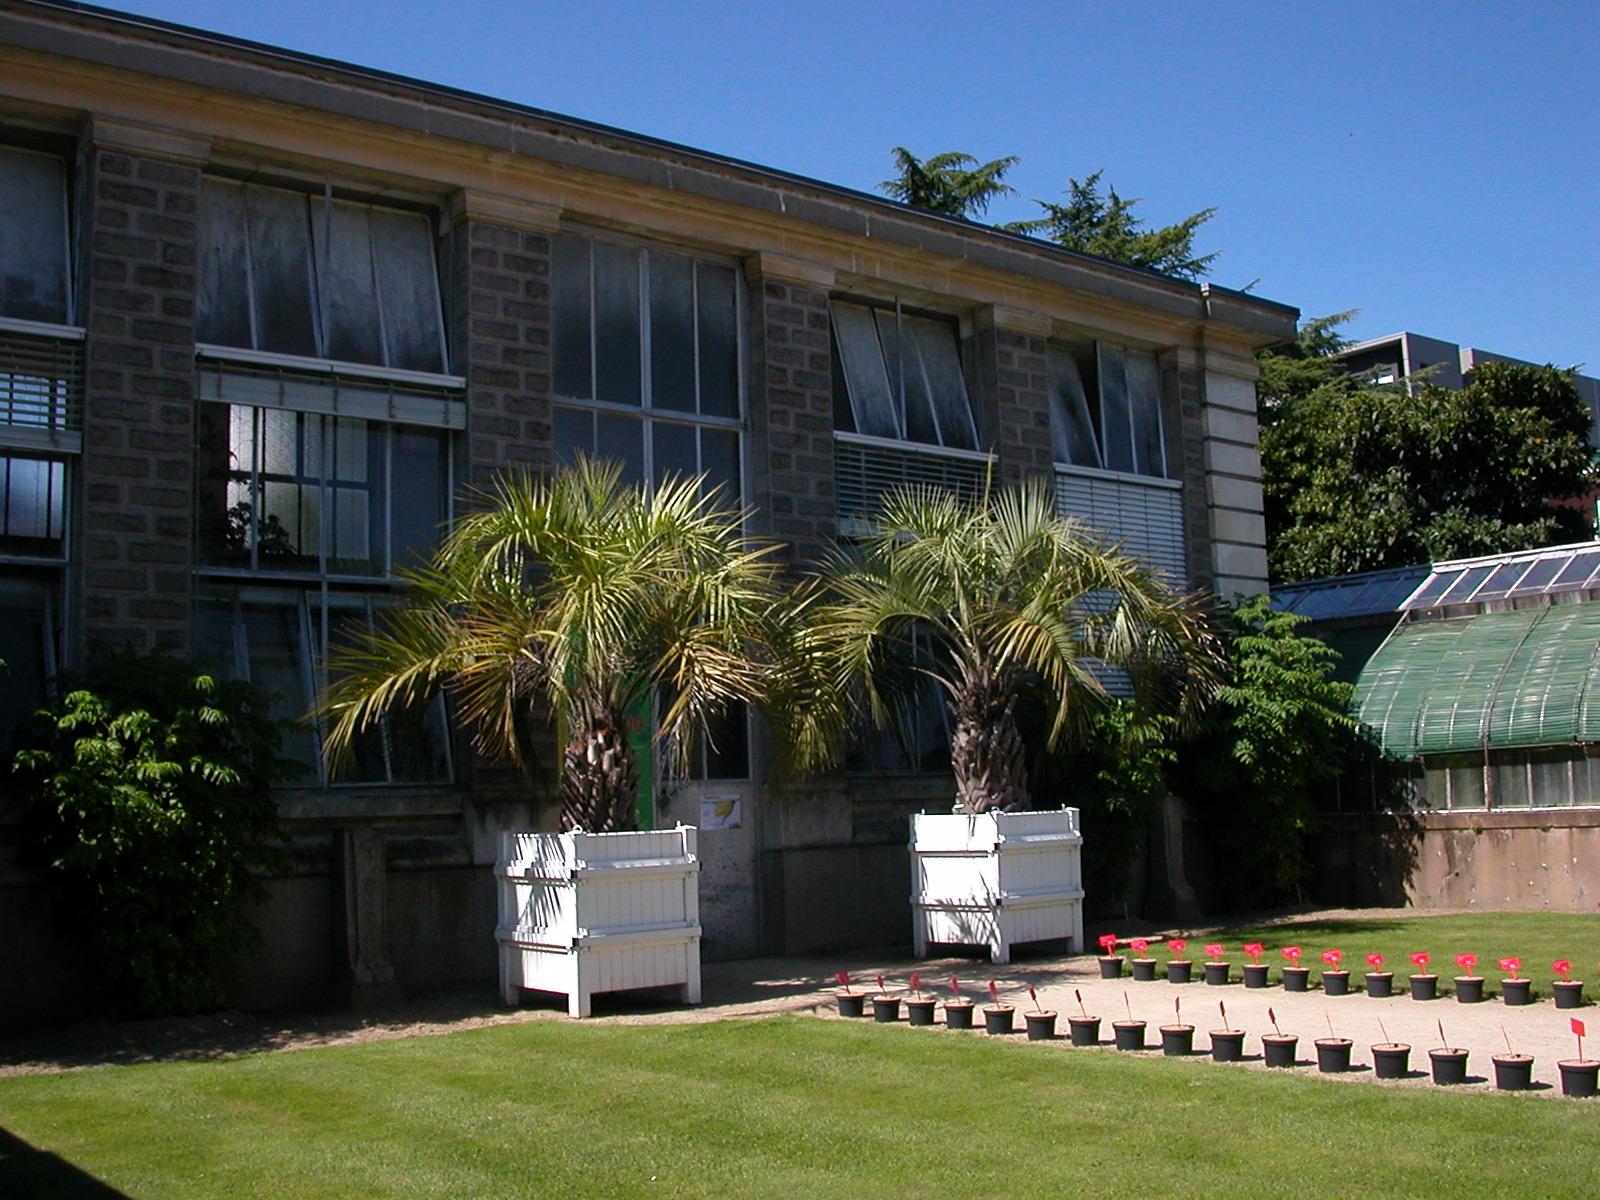 File:Jardin des plantes Nantes-orangerie.jpg - Wikimedia Commons